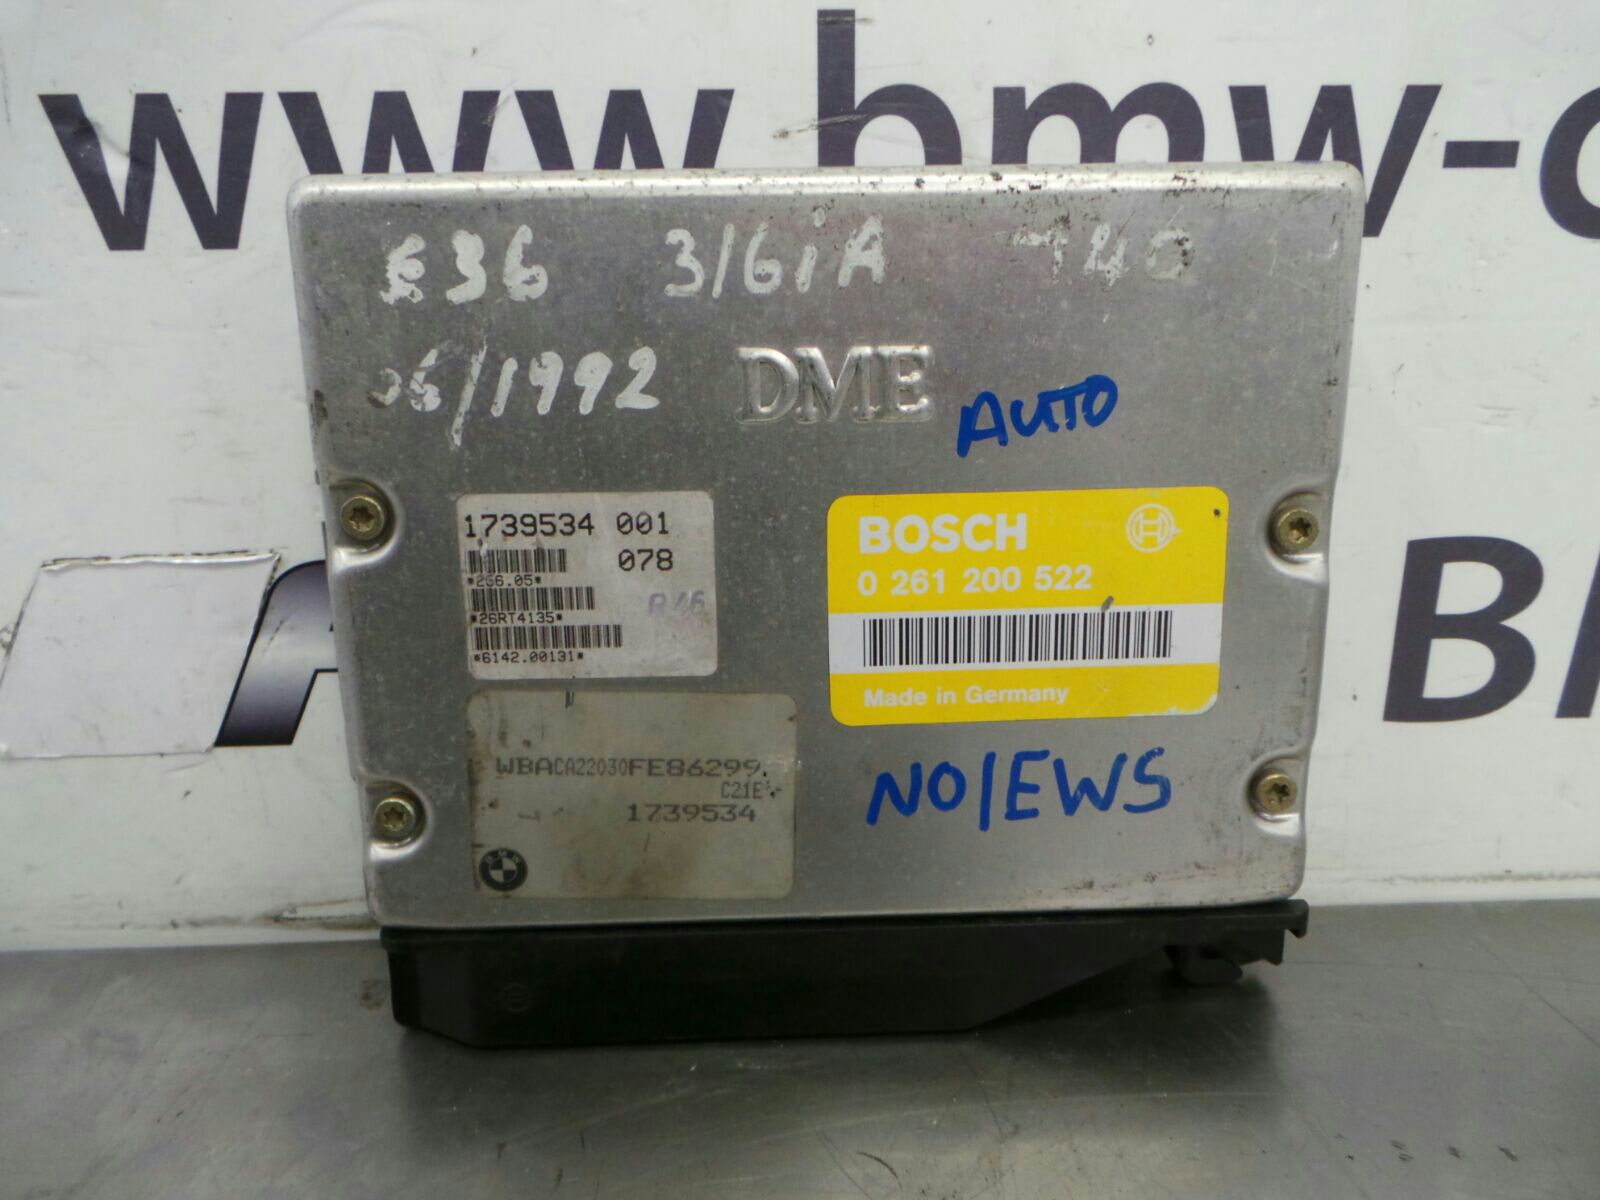 02-08 Locking Wheel Bolts 12x1.5 Nuts for Mercedes C-Class C30 CDi AMG W203